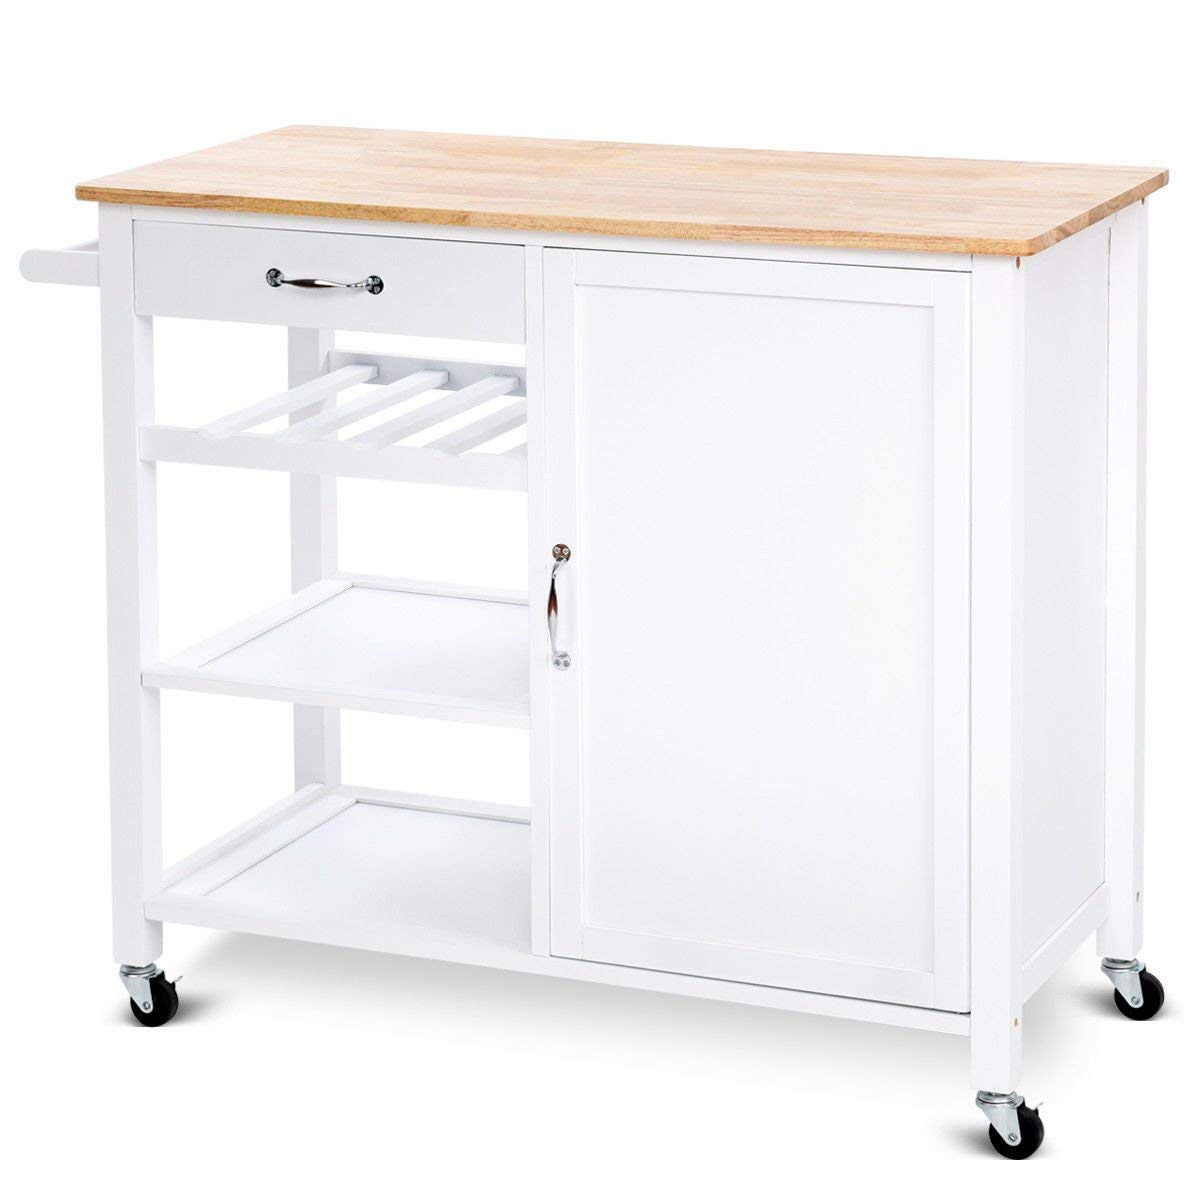 Giantex 4-Tier Kitchen Trolley Cart w/Wheels Rolling Storage Cabinet Wooden Table Multi-Function Island Cart Kitchen Truck White